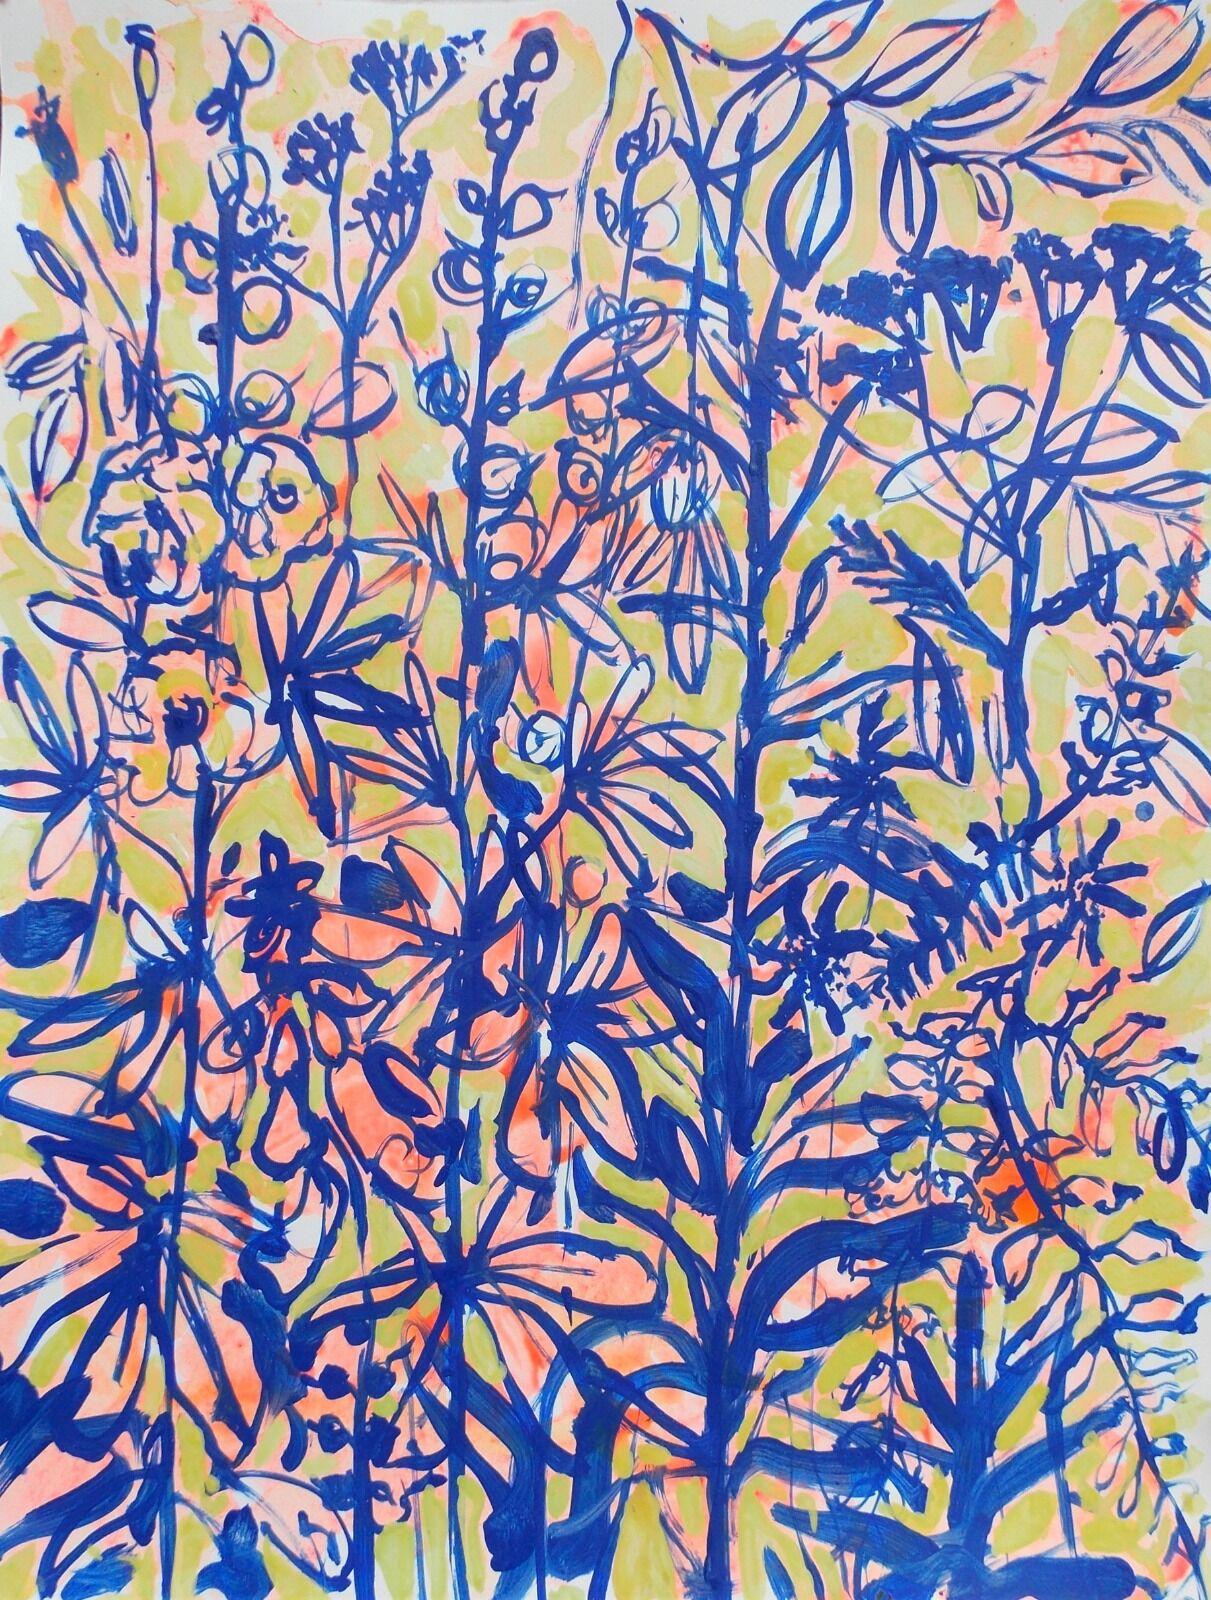 Hibiscus and Verbena